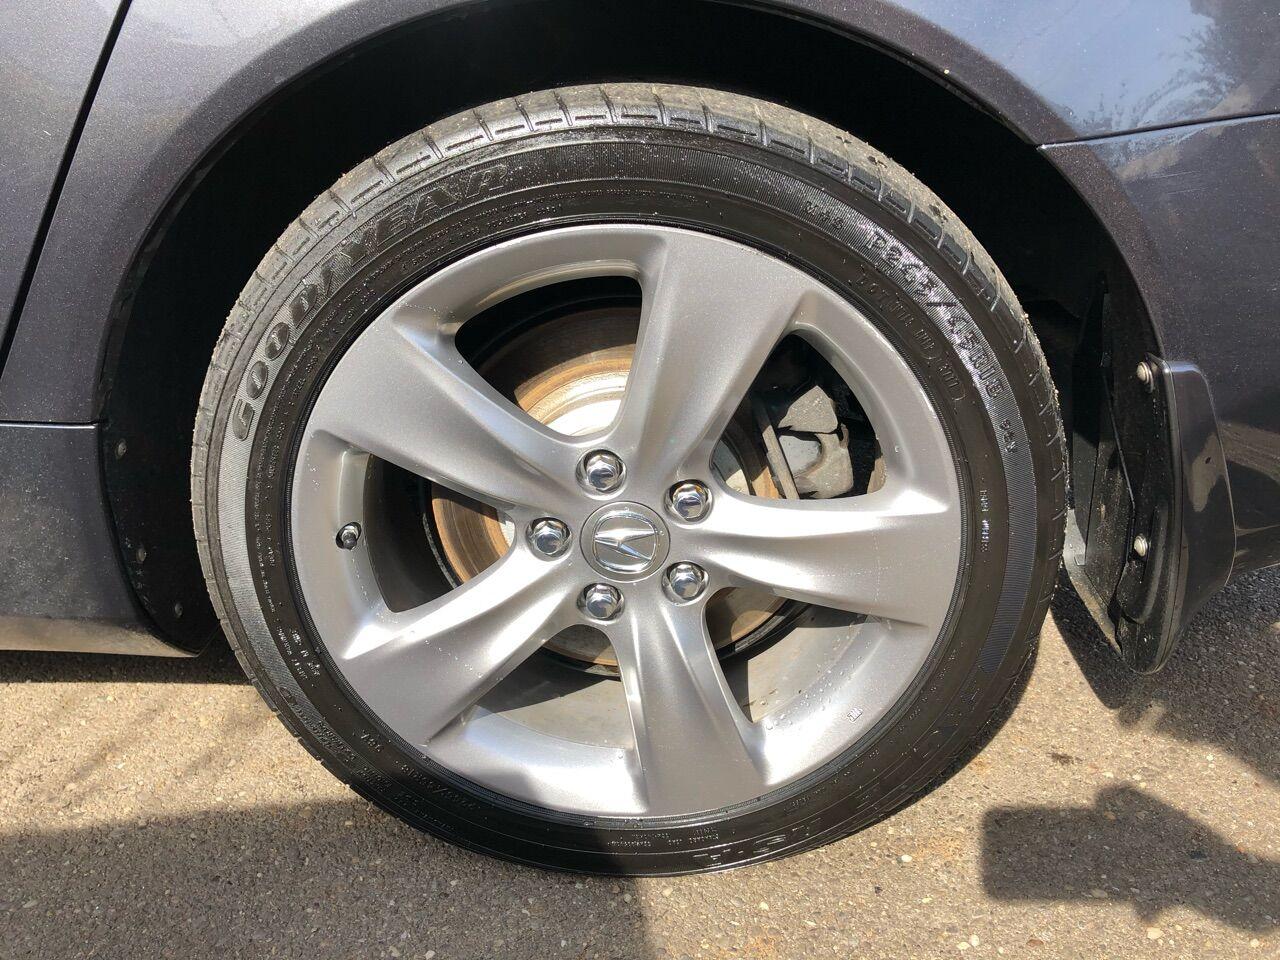 2013 Acura TL 4dr Car